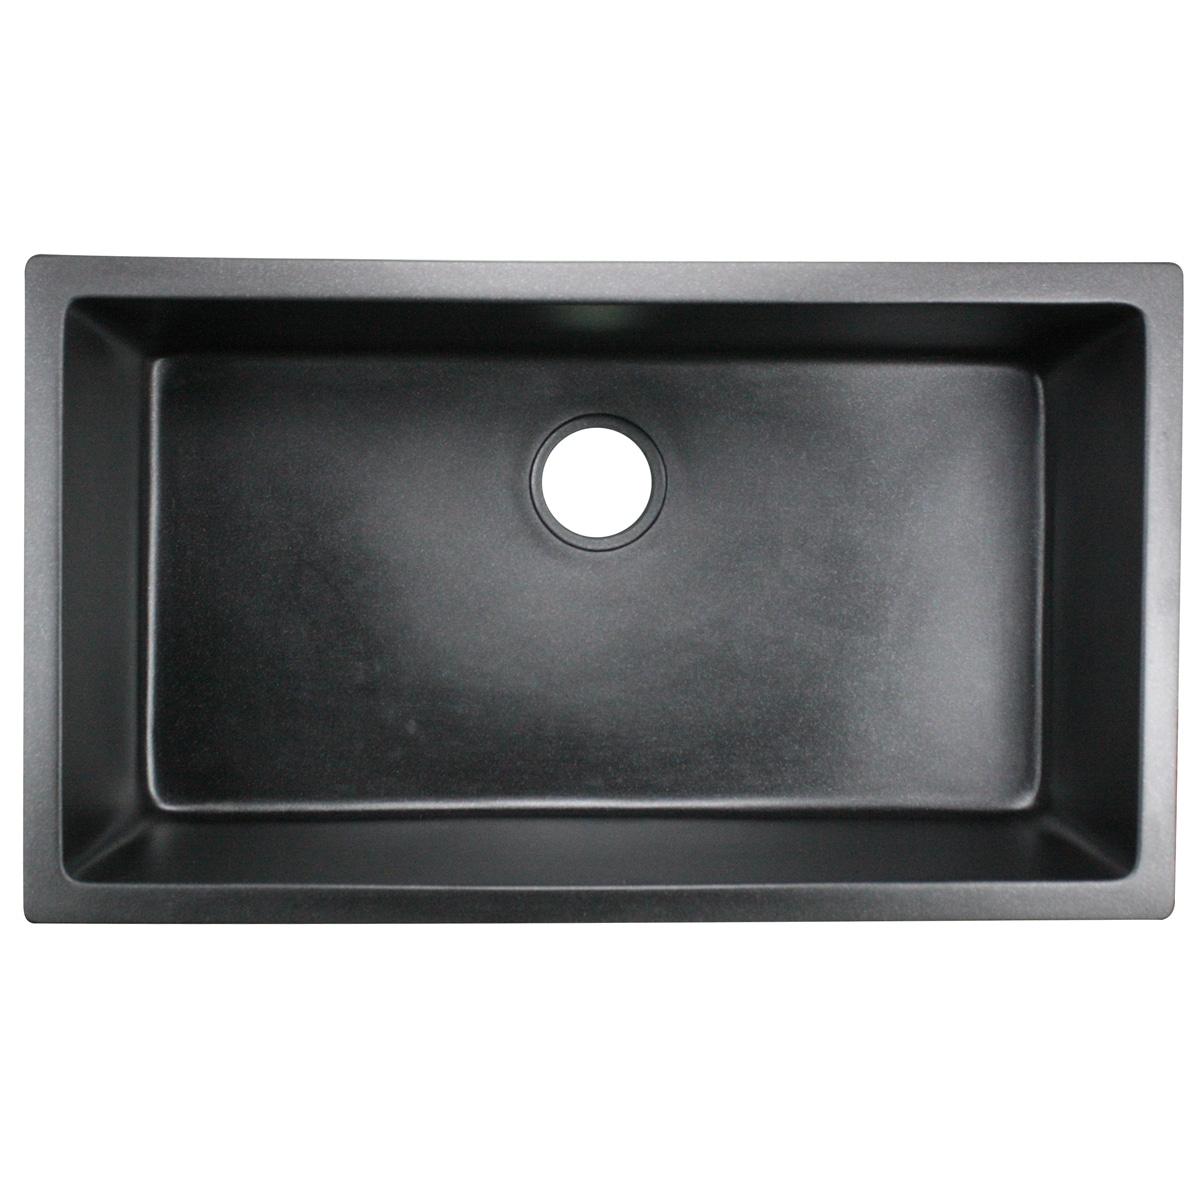 black undermount kitchen sinks. Highpoint Collection Granite Composite 33 Inch Single Bowl Black Undermount  Kitchen Sink Free Shipping Today Overstock 16290208